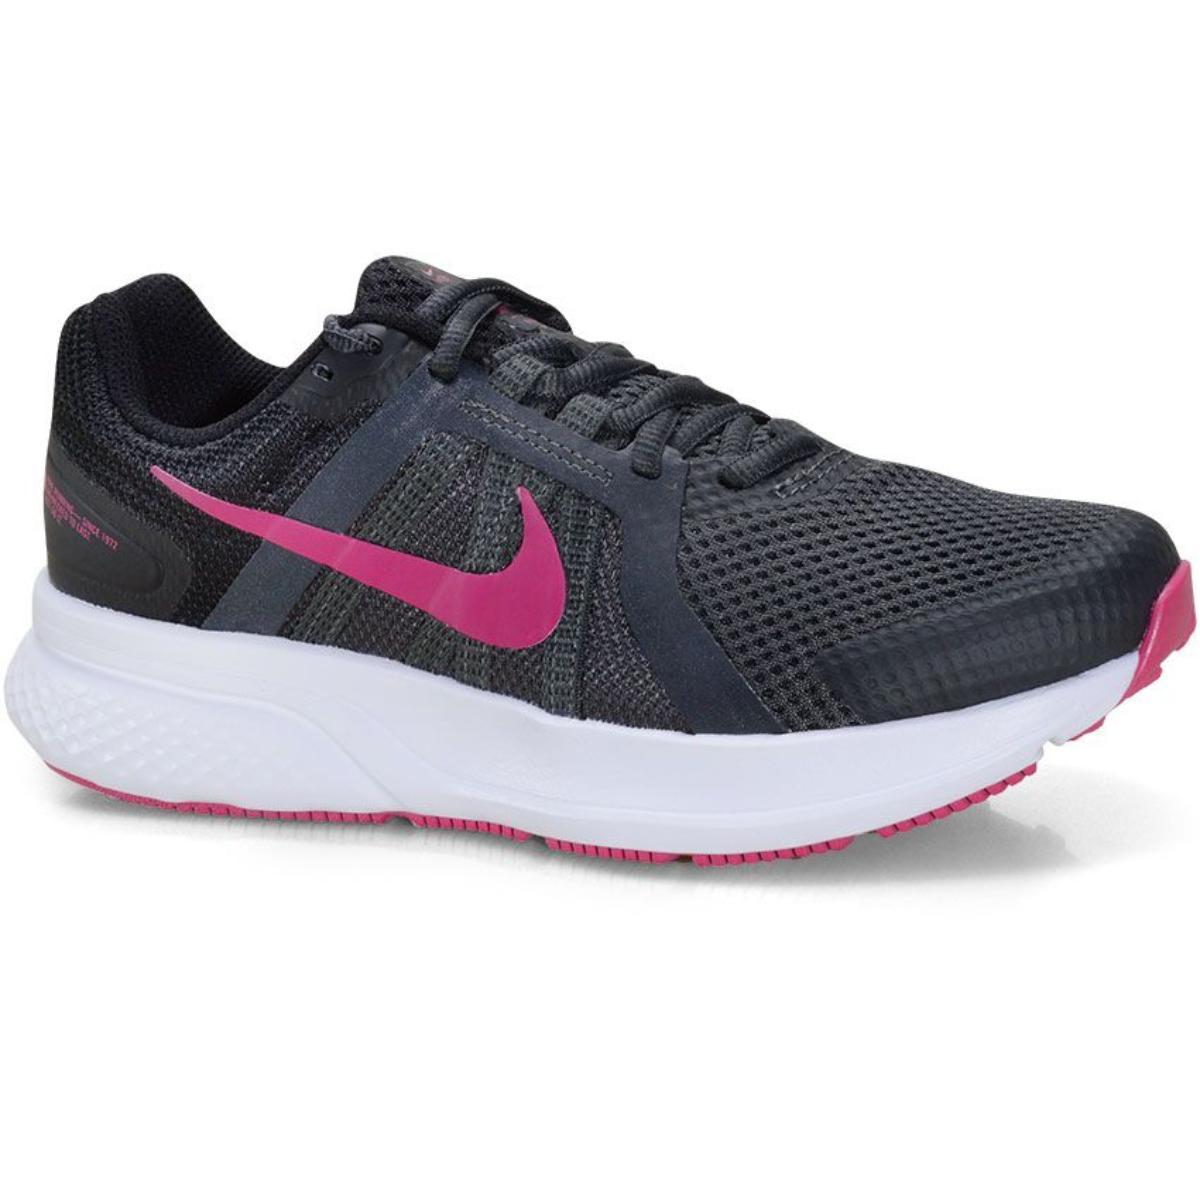 Tênis Feminino Nike Cu3528-011 Run Swift 2 Preto/rosa